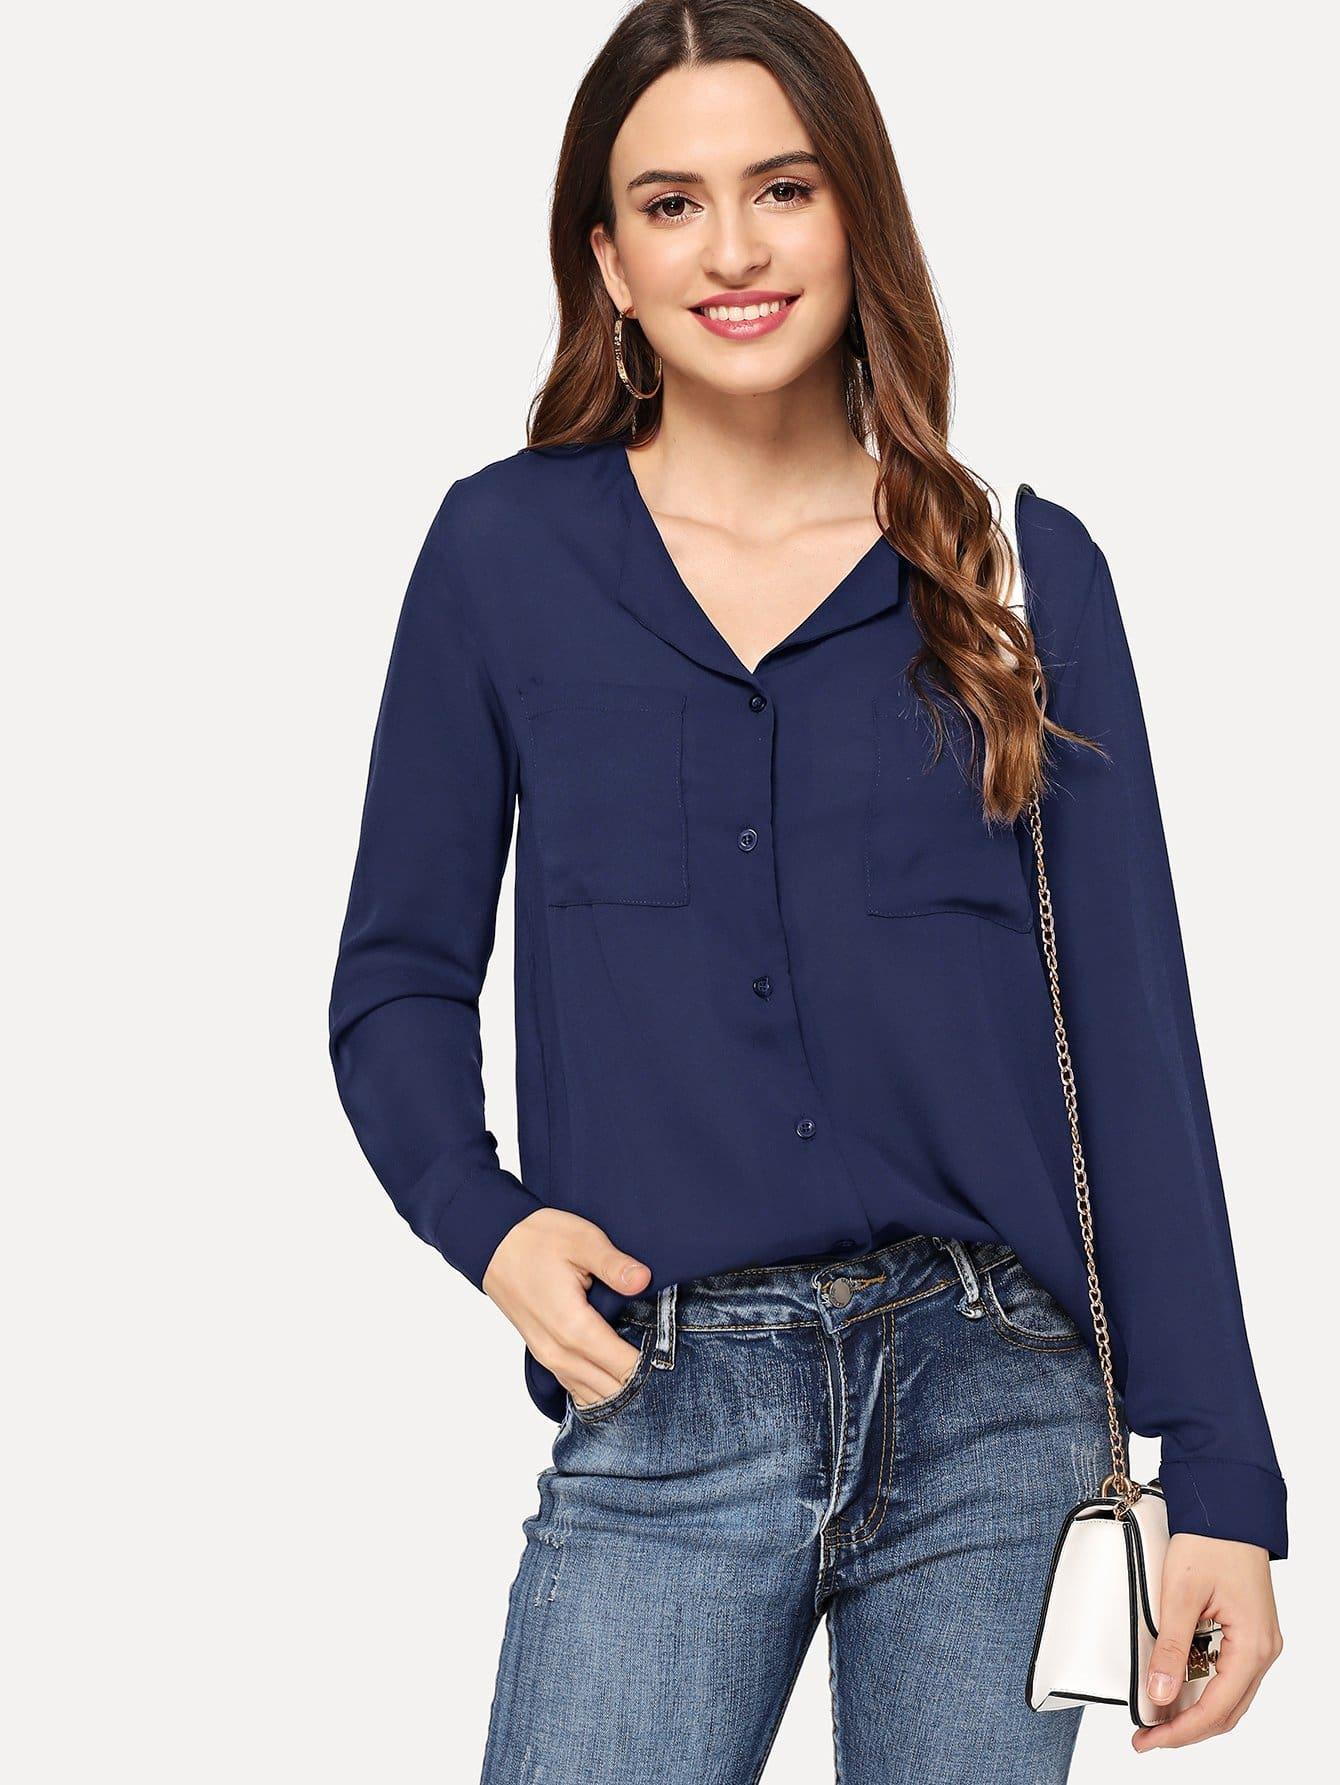 Купить Рубашка шифона с воротником Revere и с карманами, Jana, SheIn